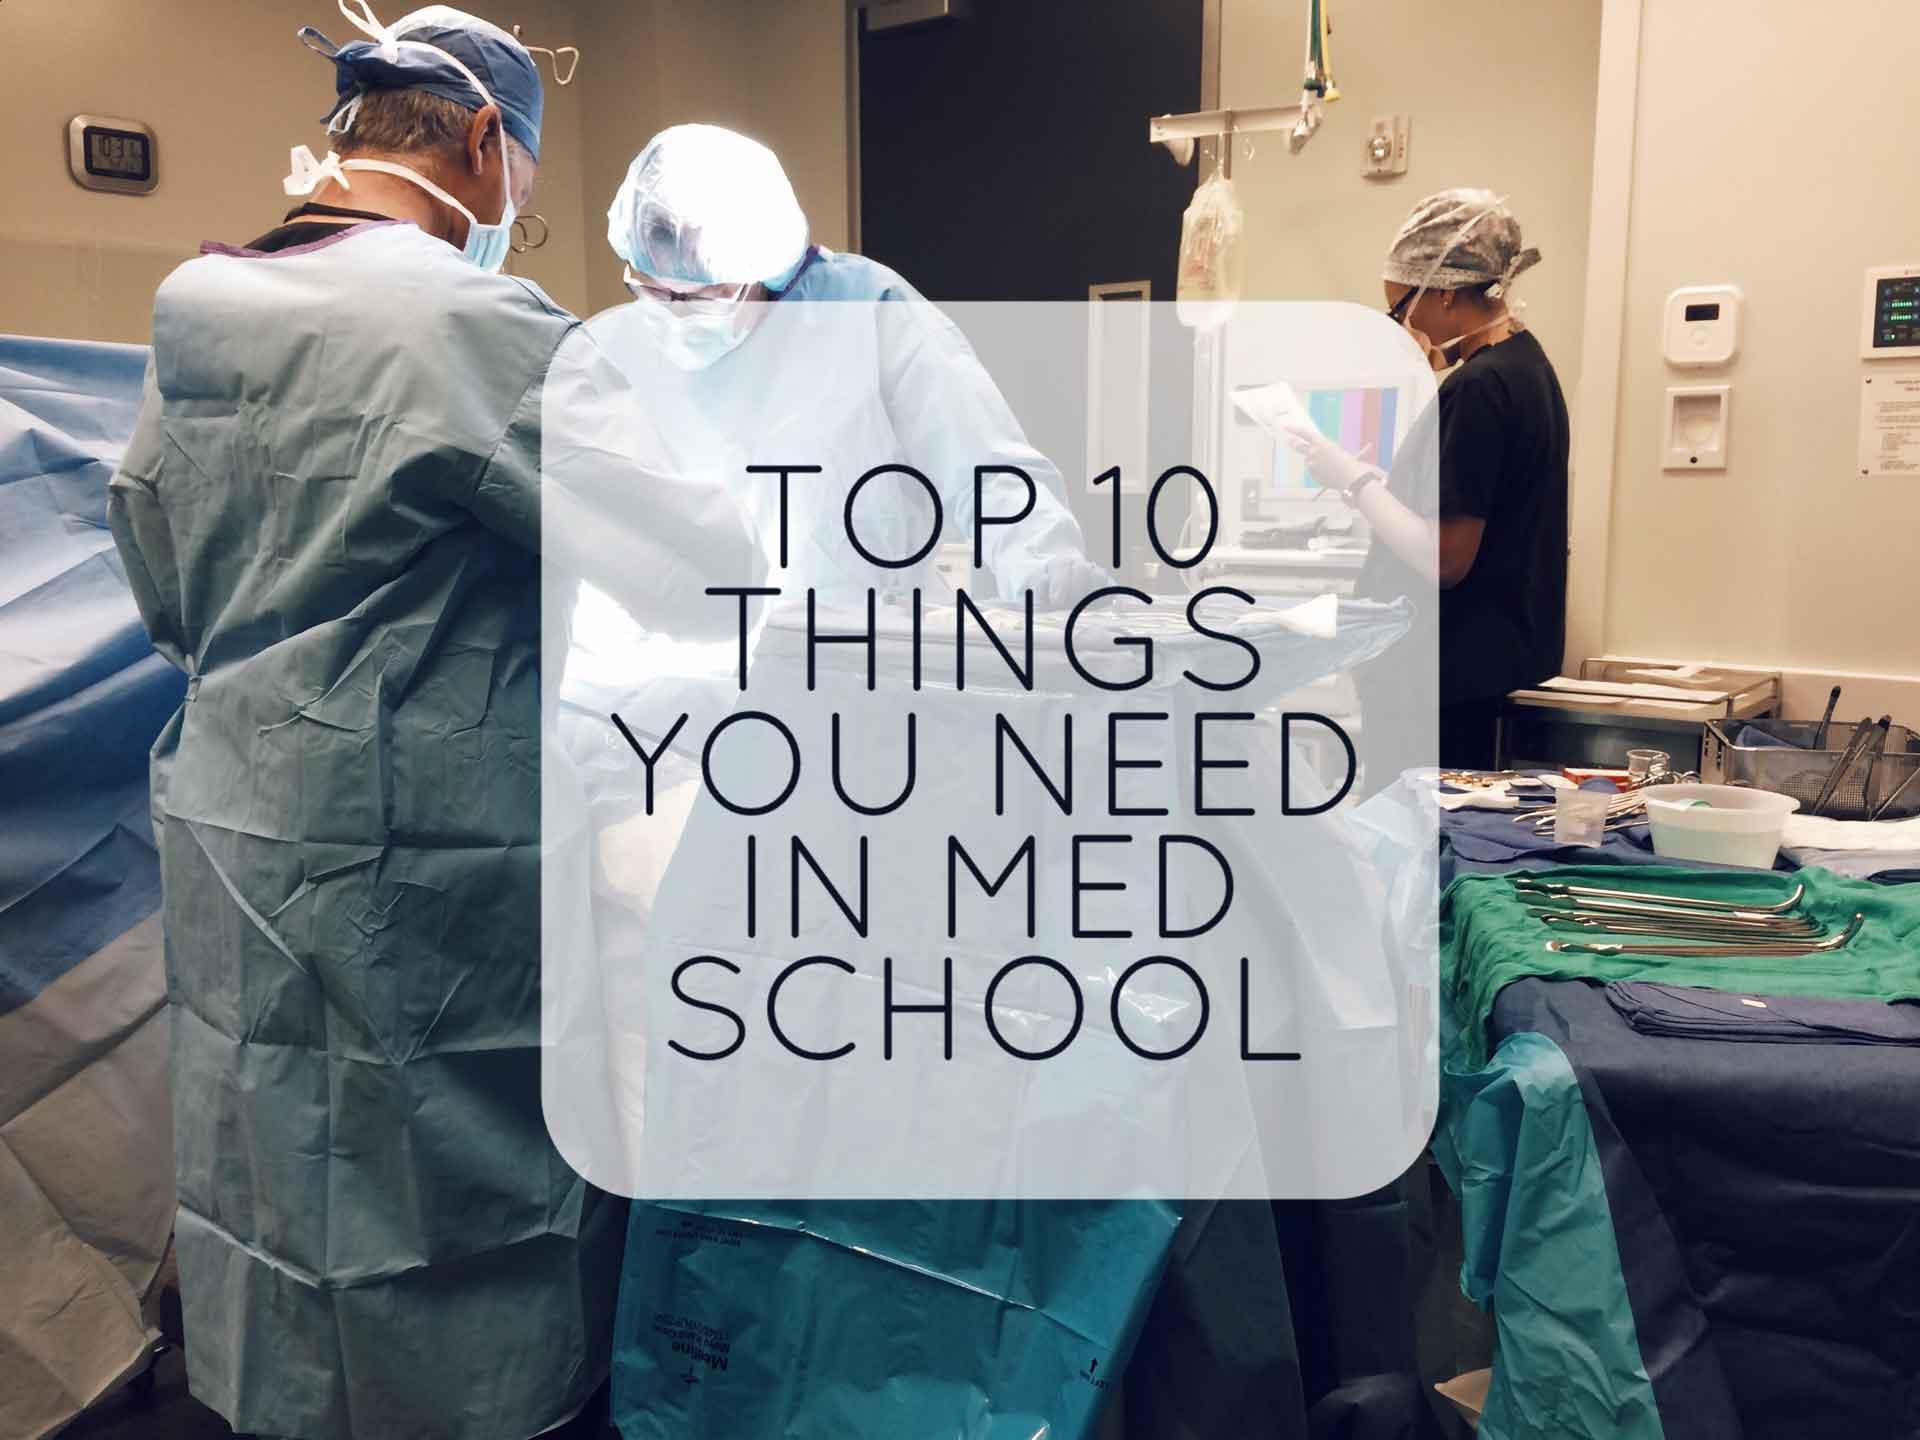 Top 10 Things You Need in Medical School